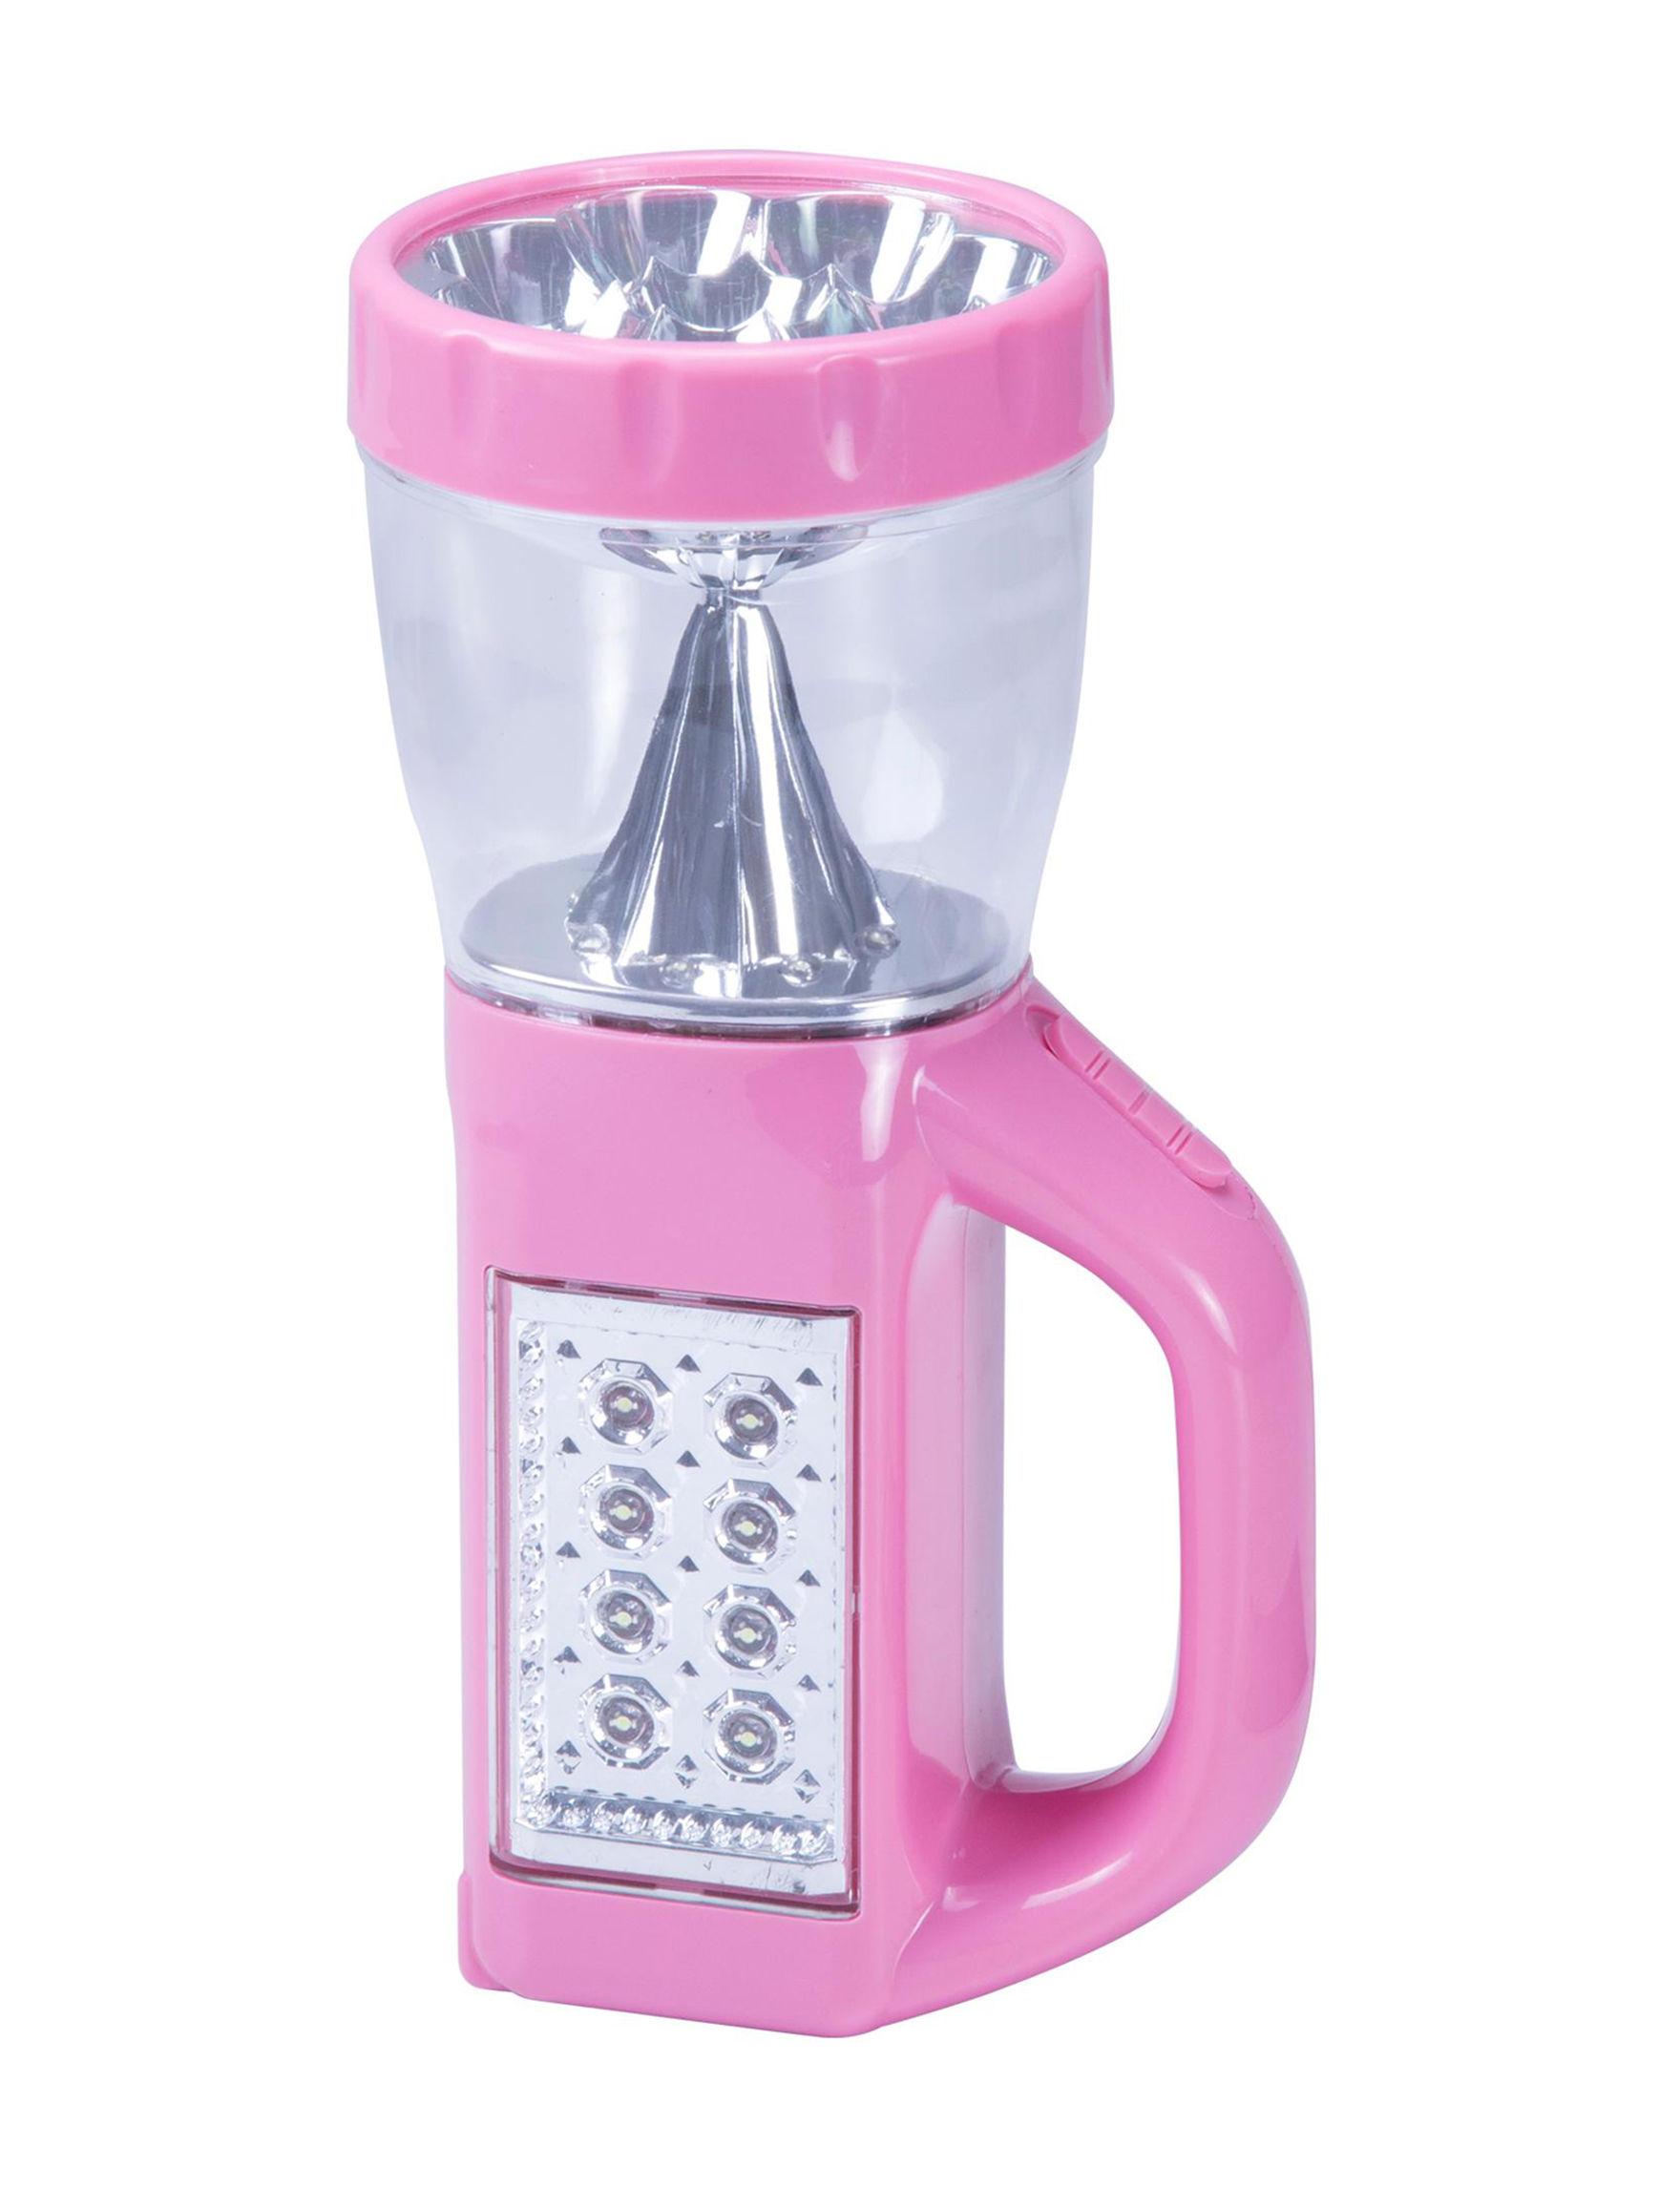 Wakeman Pink Lights & Lanterns Camping & Outdoor Gear